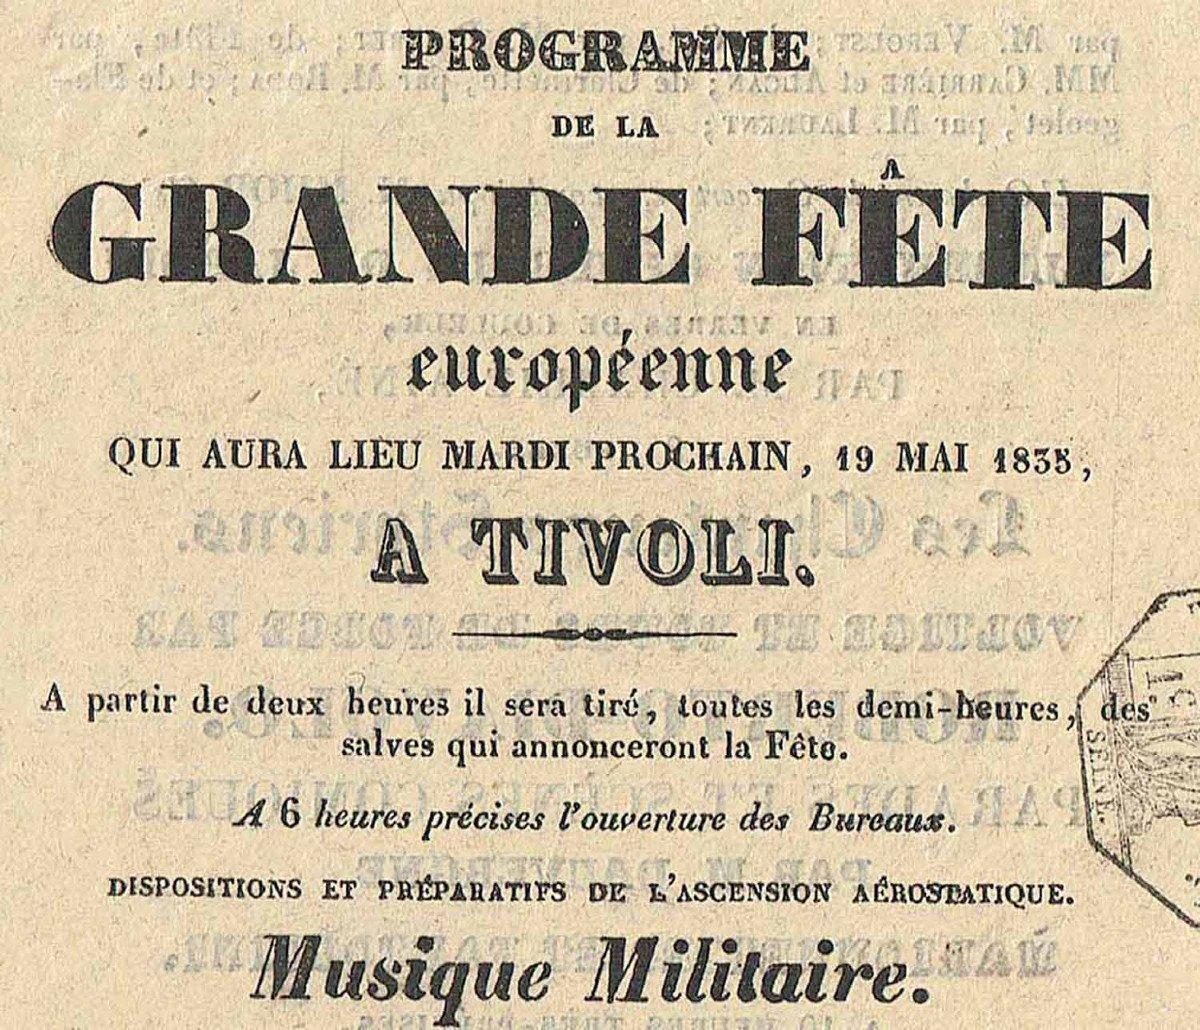 Programme FÊte Tivoli 1835  -photo-3